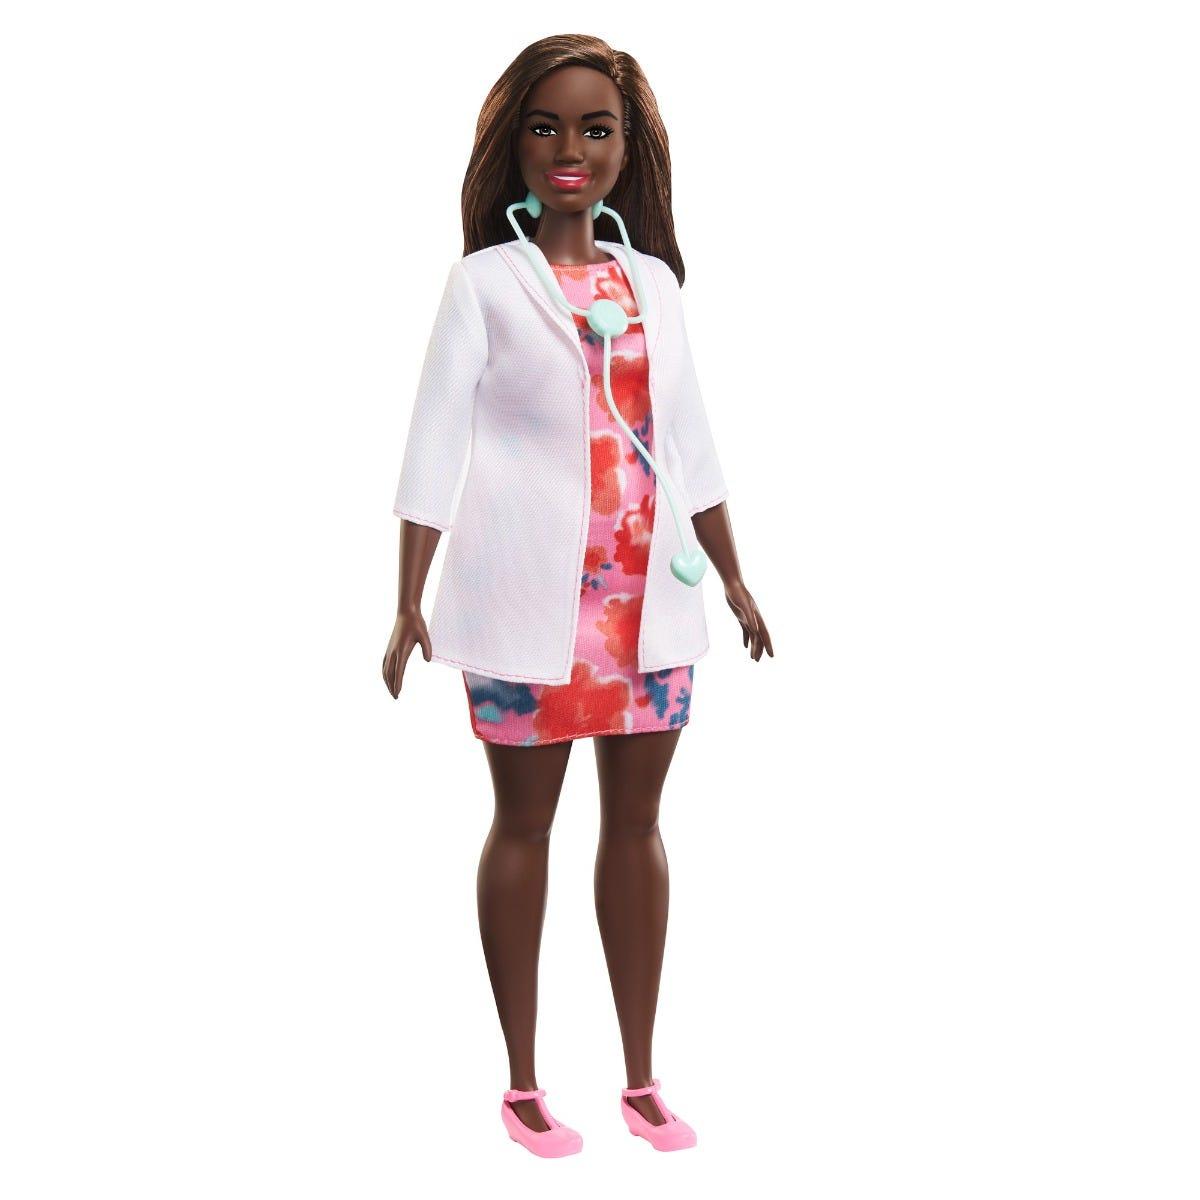 Barbie Doctor Doll